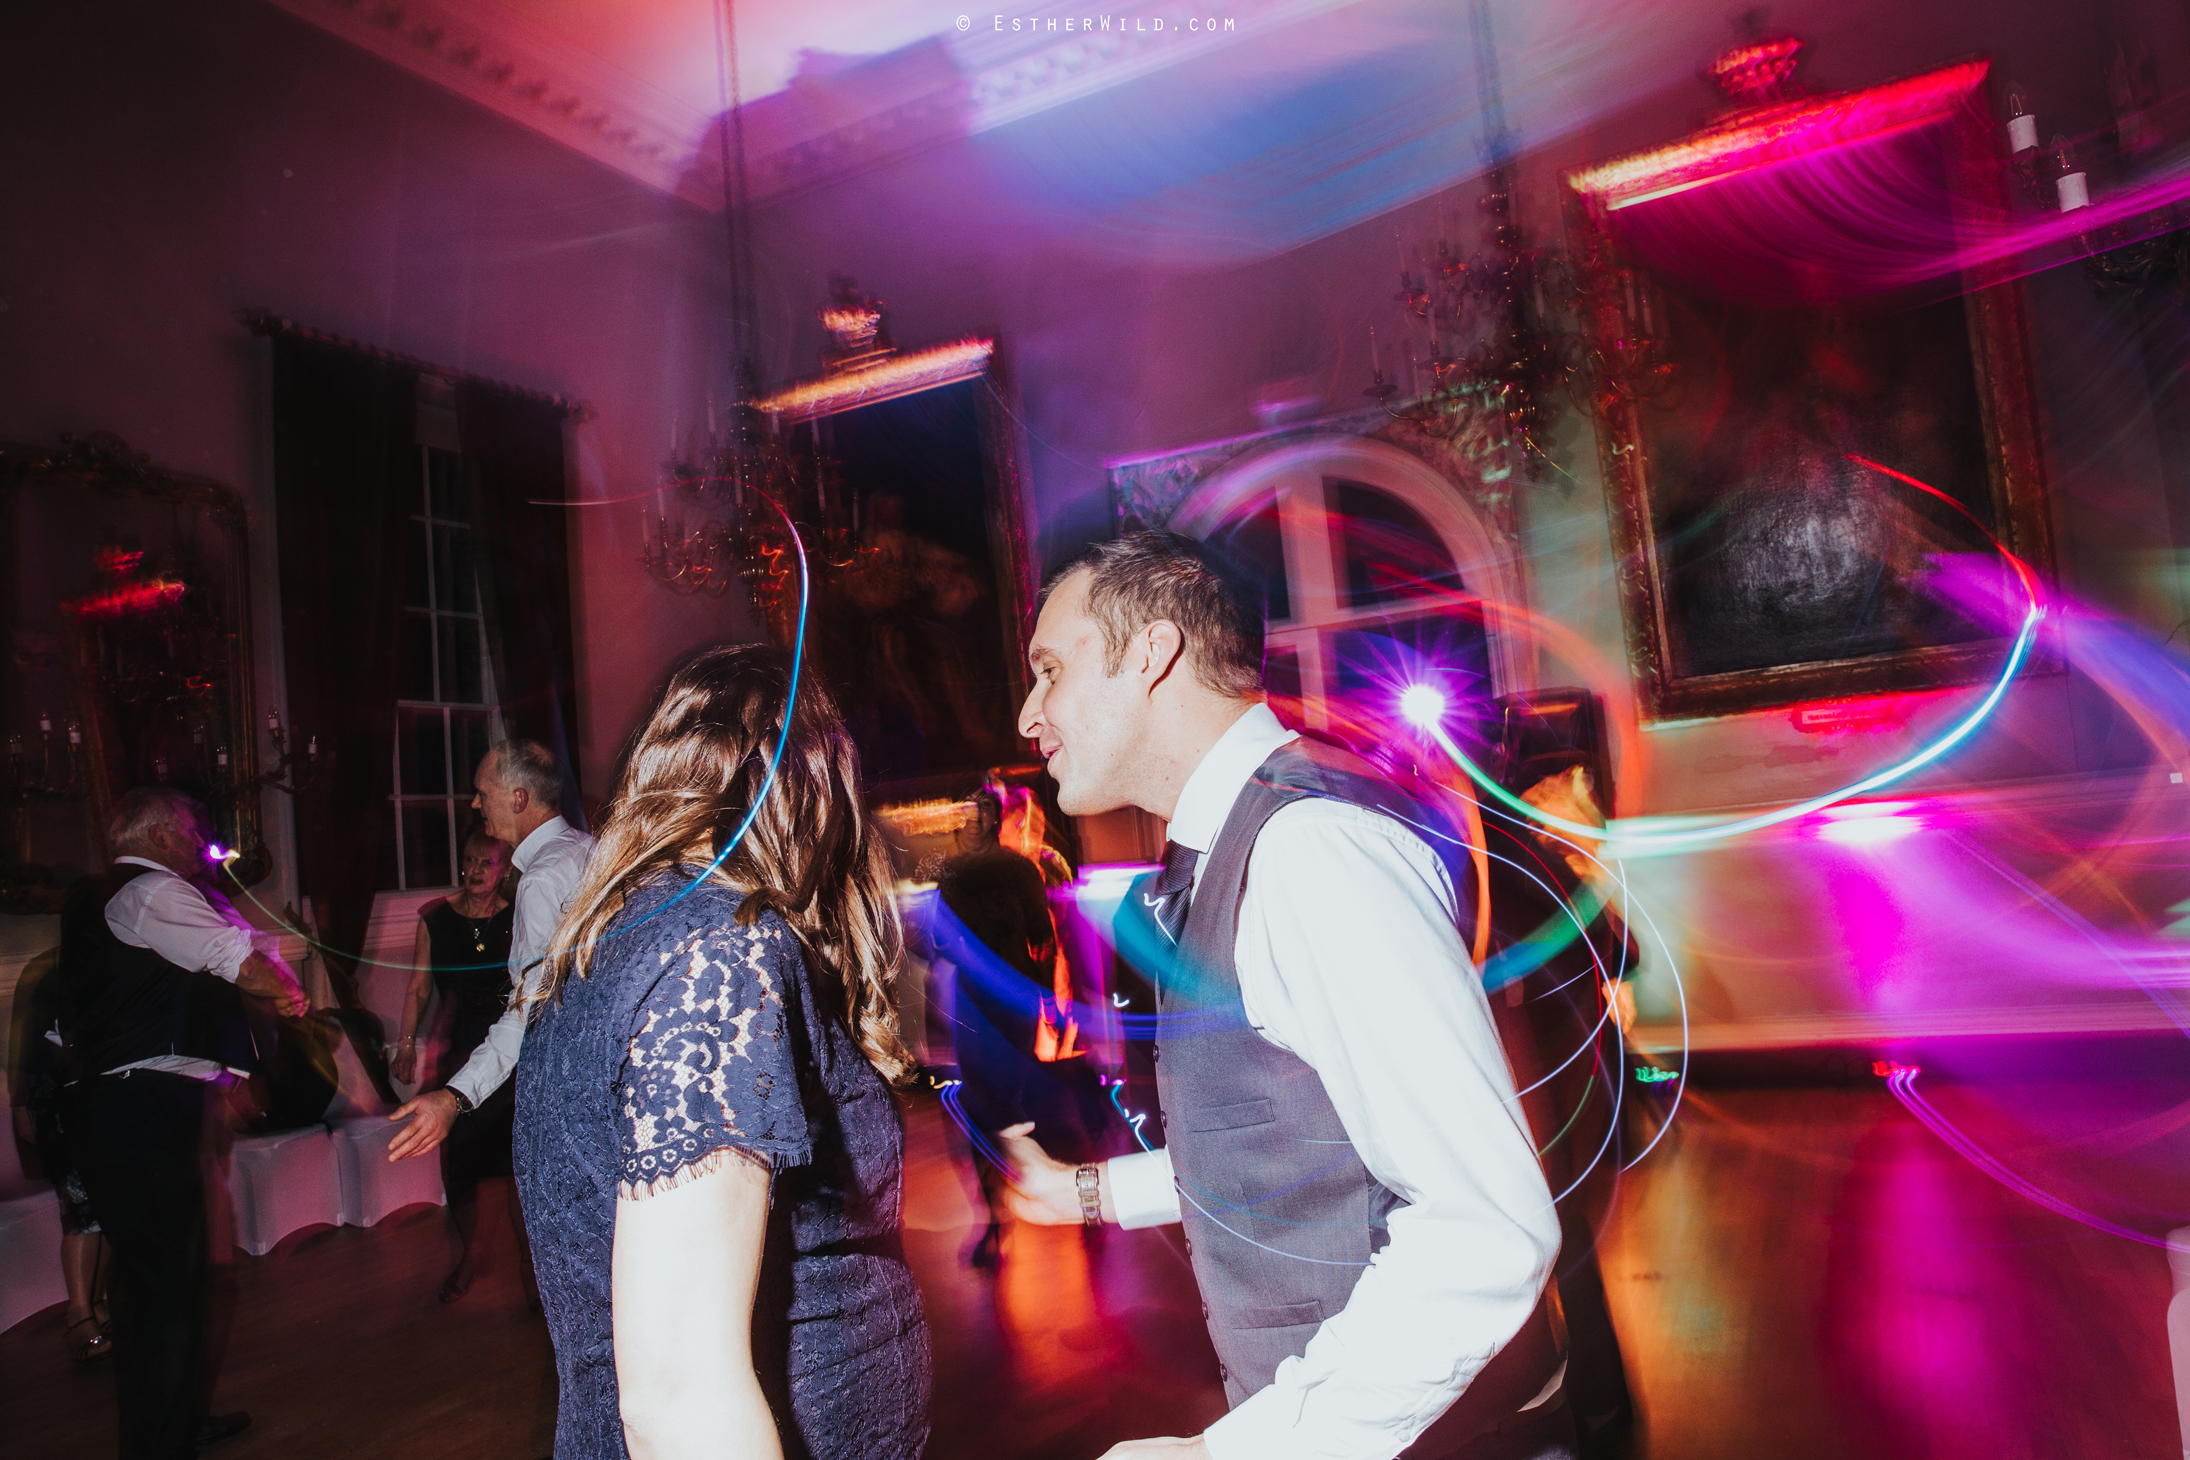 Wedding_Kings_Lynn_Town_Hall_Norfolk_Photographer_Esther_Wild_IMGL0957.jpg